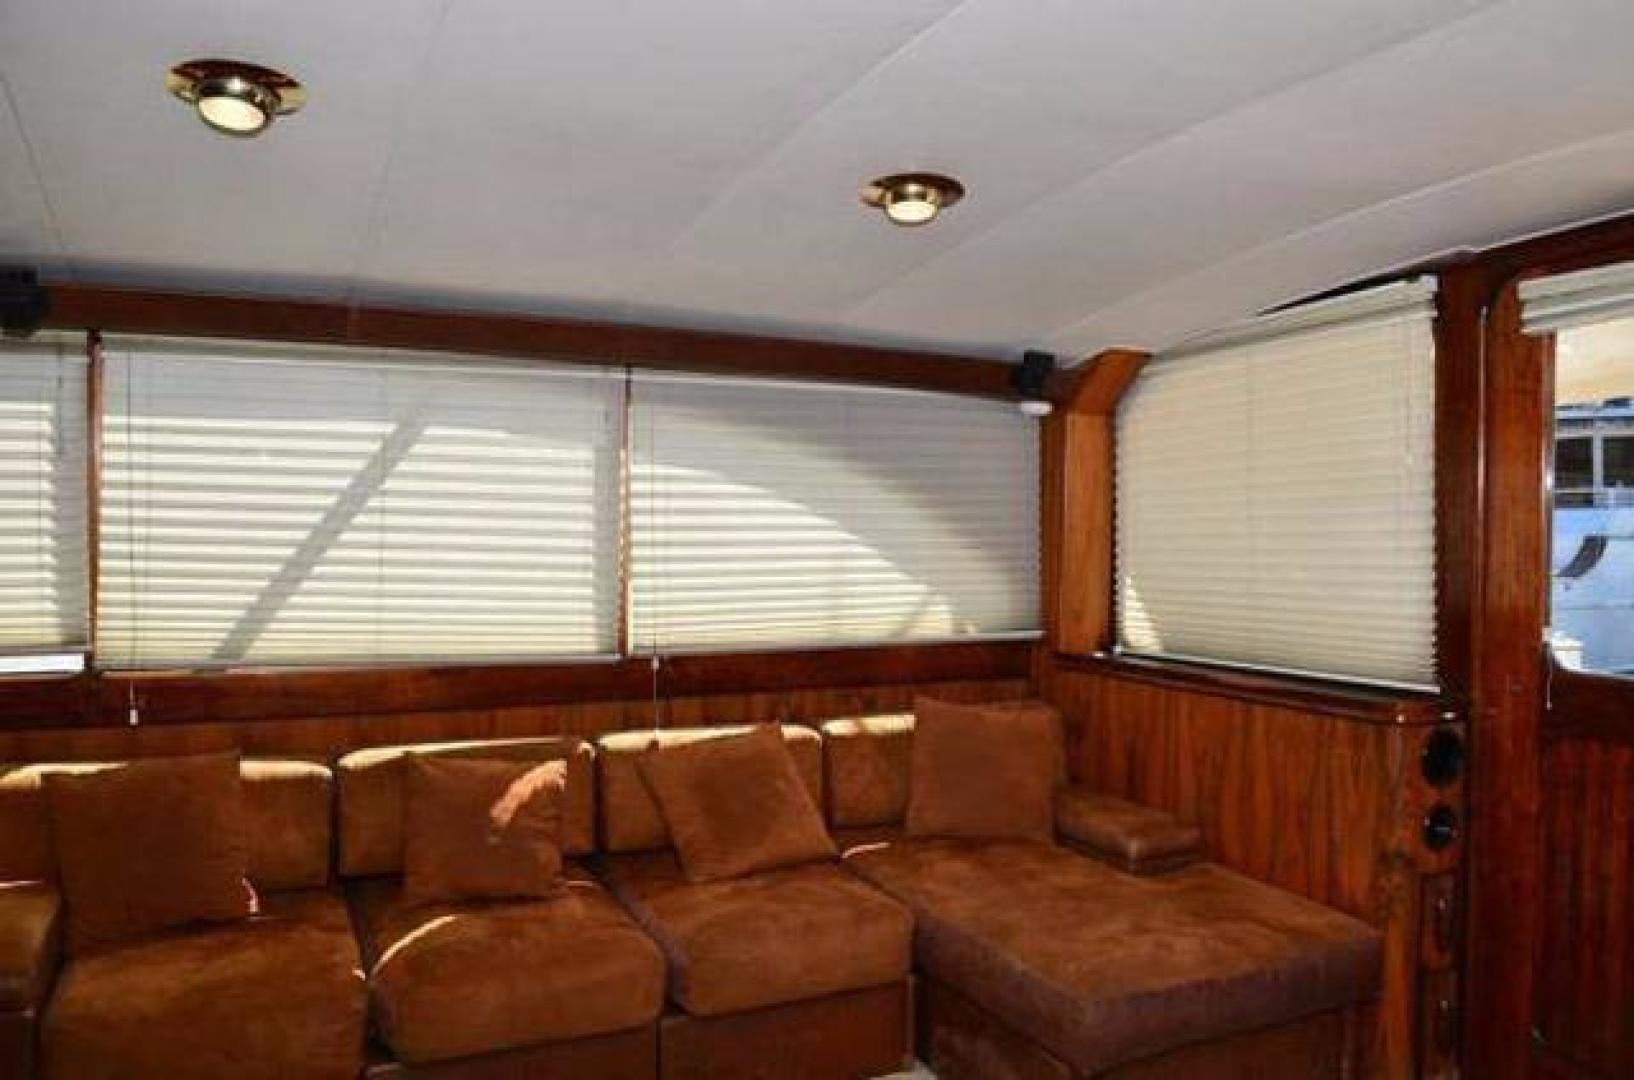 Buddy Davis-Sport Fishing Motor Yacht 1982-Rama III La Paz-Mexico-Salon Seating-387254 | Thumbnail